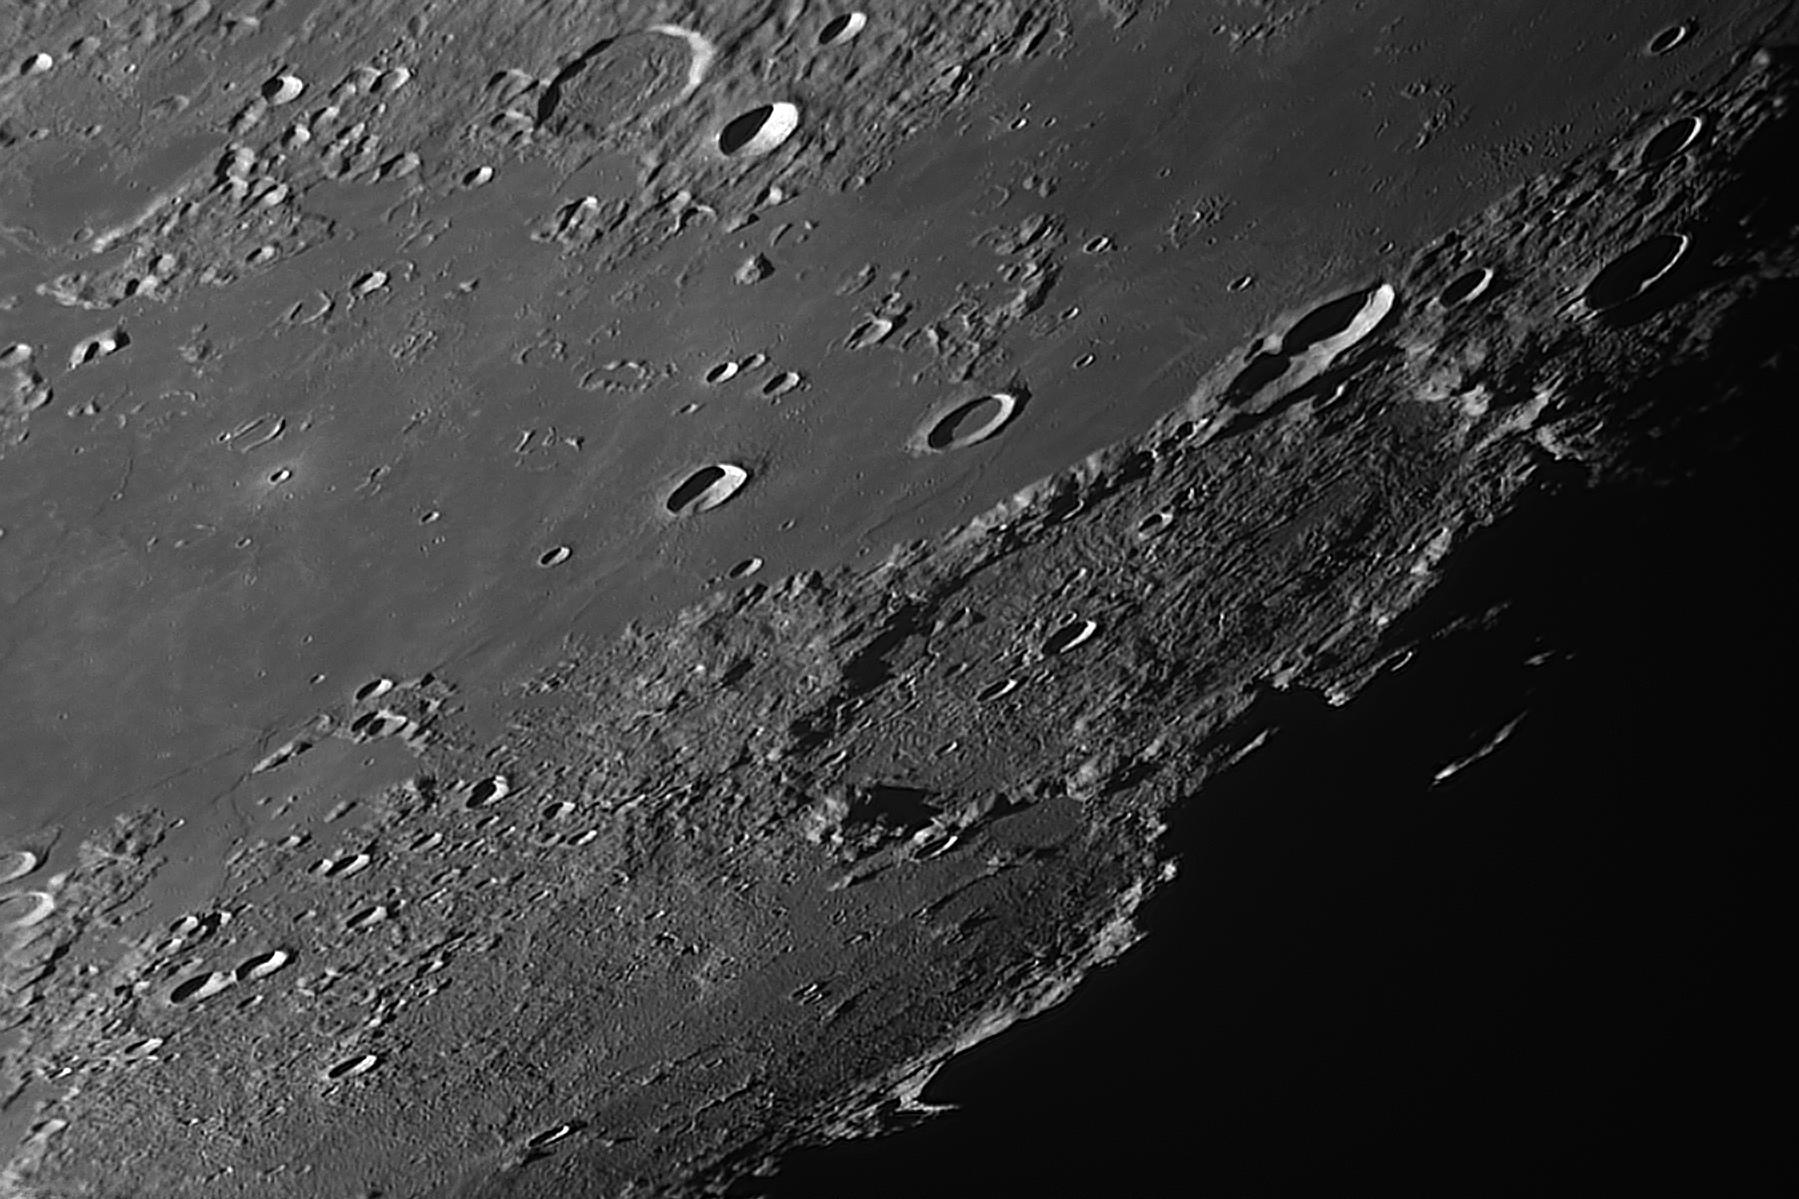 2021-02-23-2116_8-R-Moon_Herschel_C.jpg.1bfce9a212a73f6ea00193f4c3c0ba7c.jpg